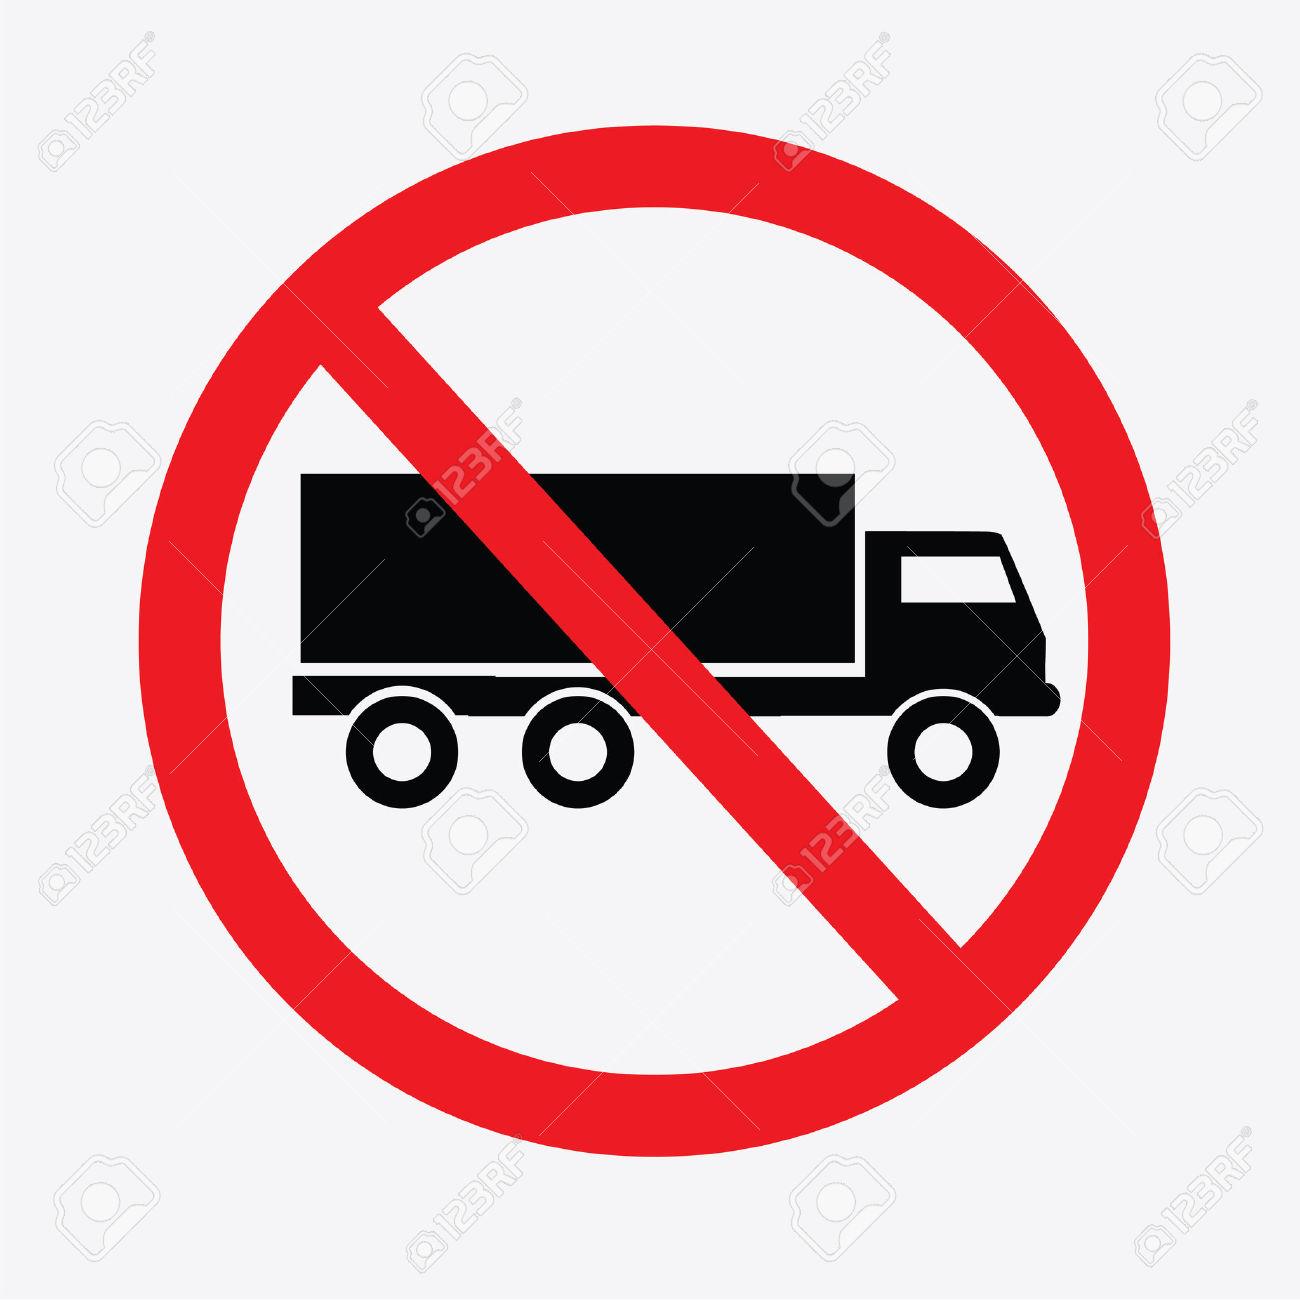 7,561 No Vehicles Stock Vector Illustration And Royalty Free No.